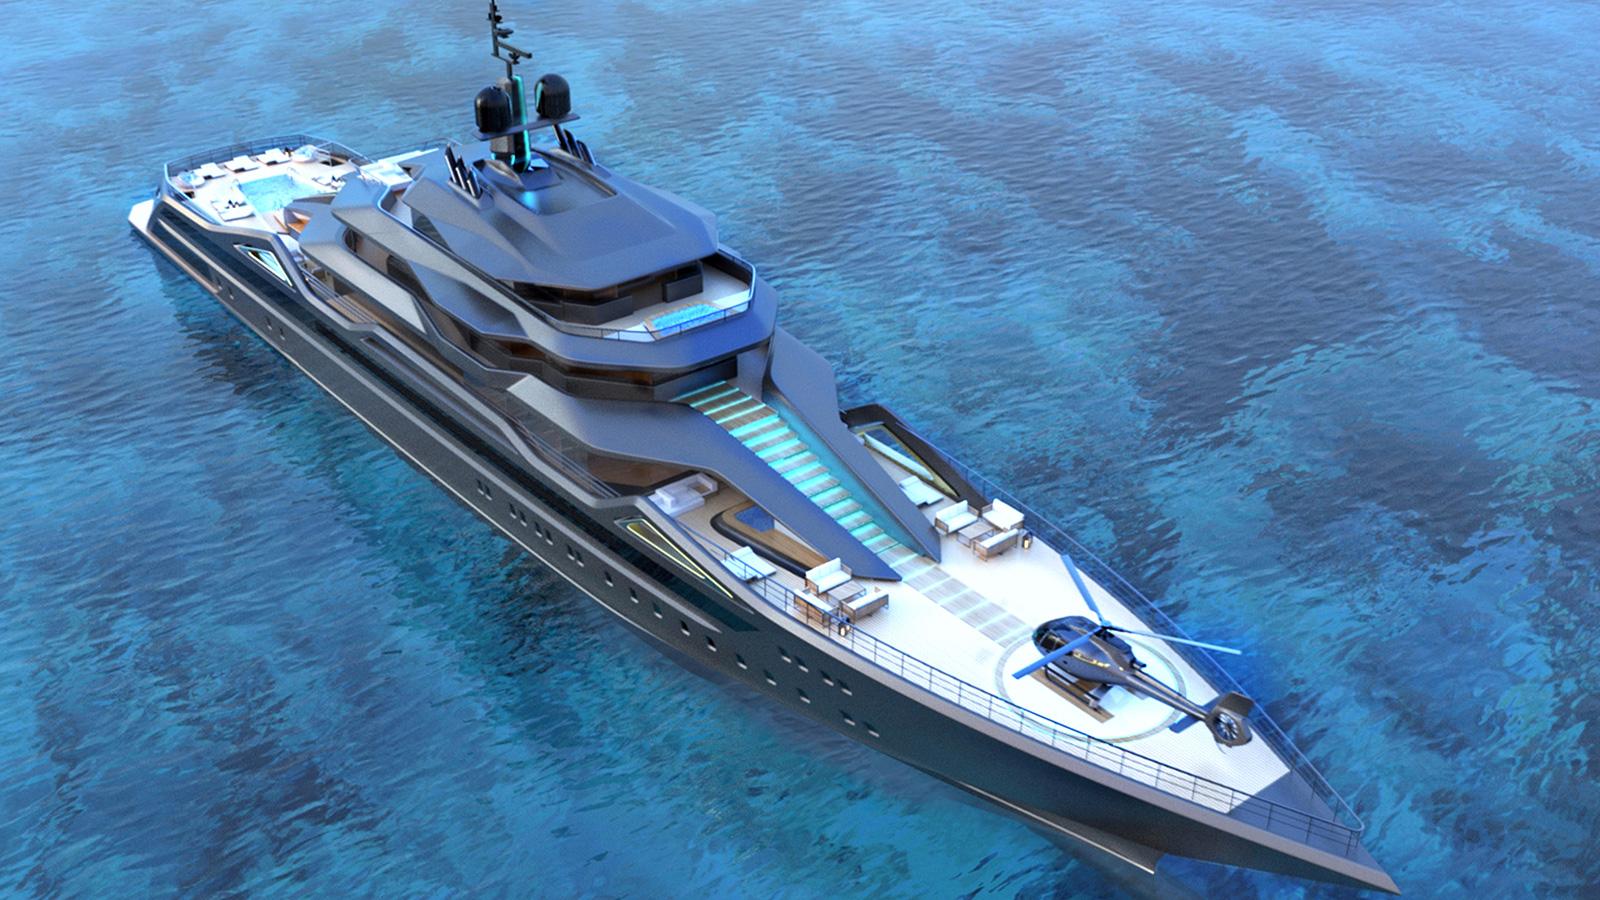 bow-view-of-the-roberto-curto-superyacht-concept-mauna-kea